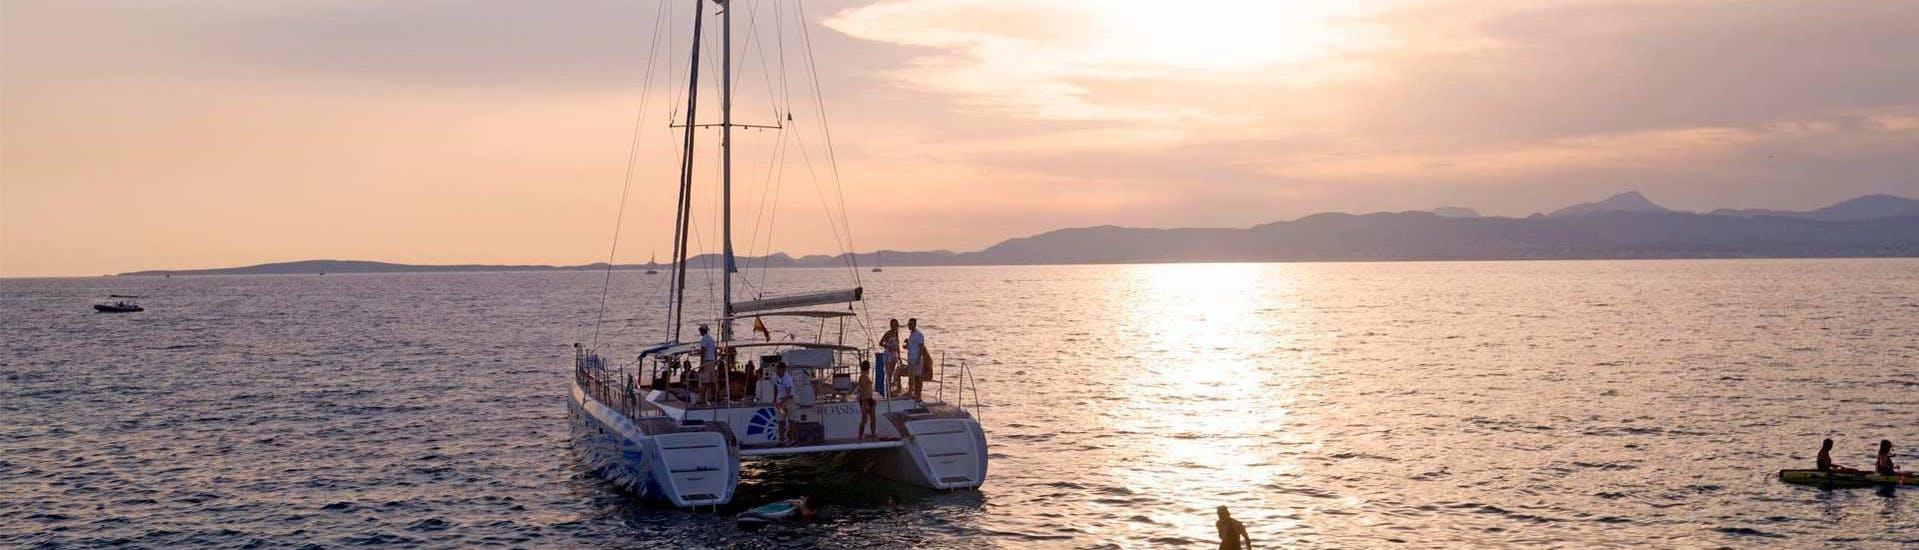 Sunset Catamaran Cruise in the Bay of Palma with Tapas